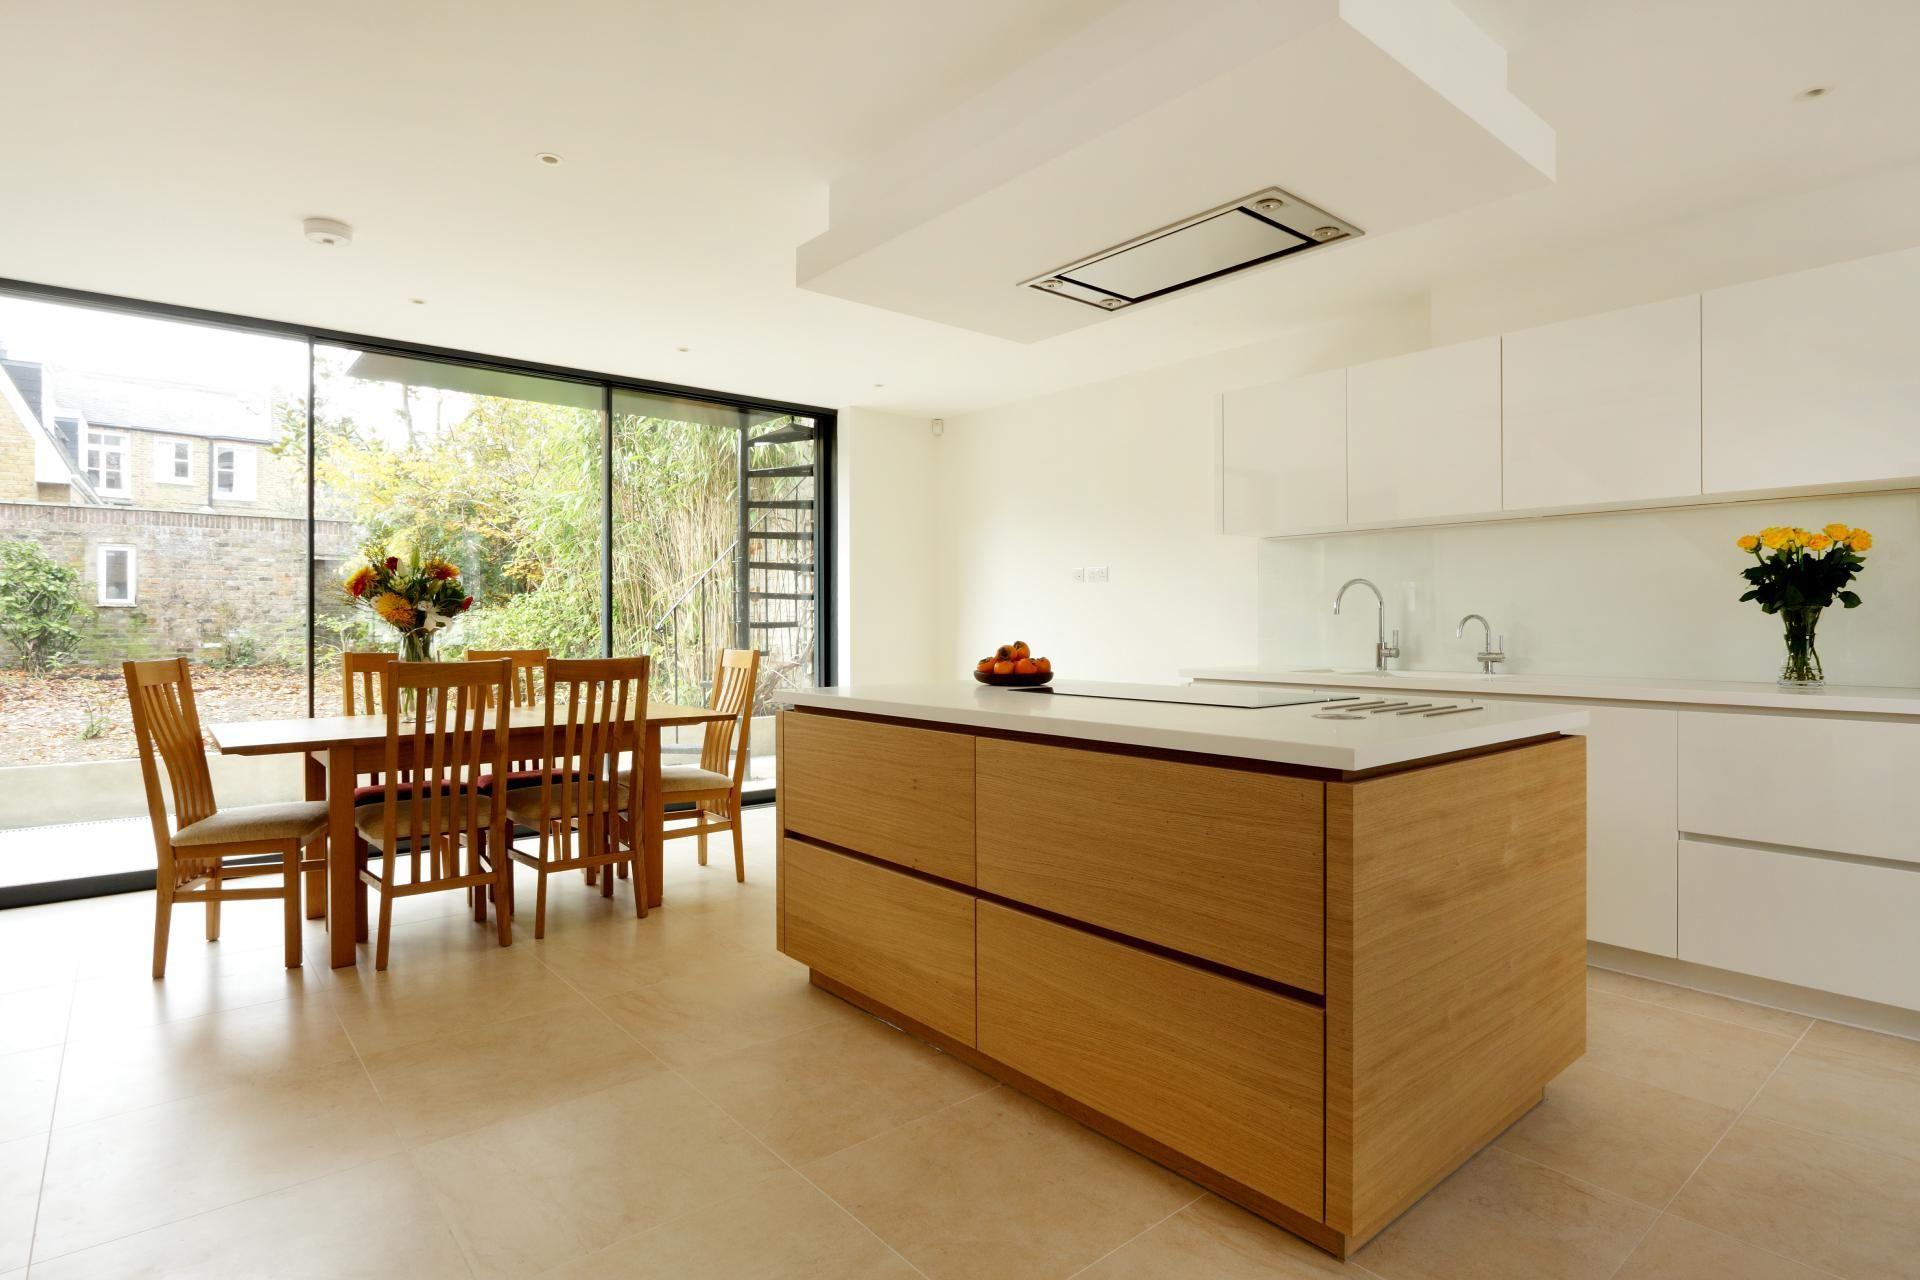 Alno kitchen cabinets chicago - Kitchens